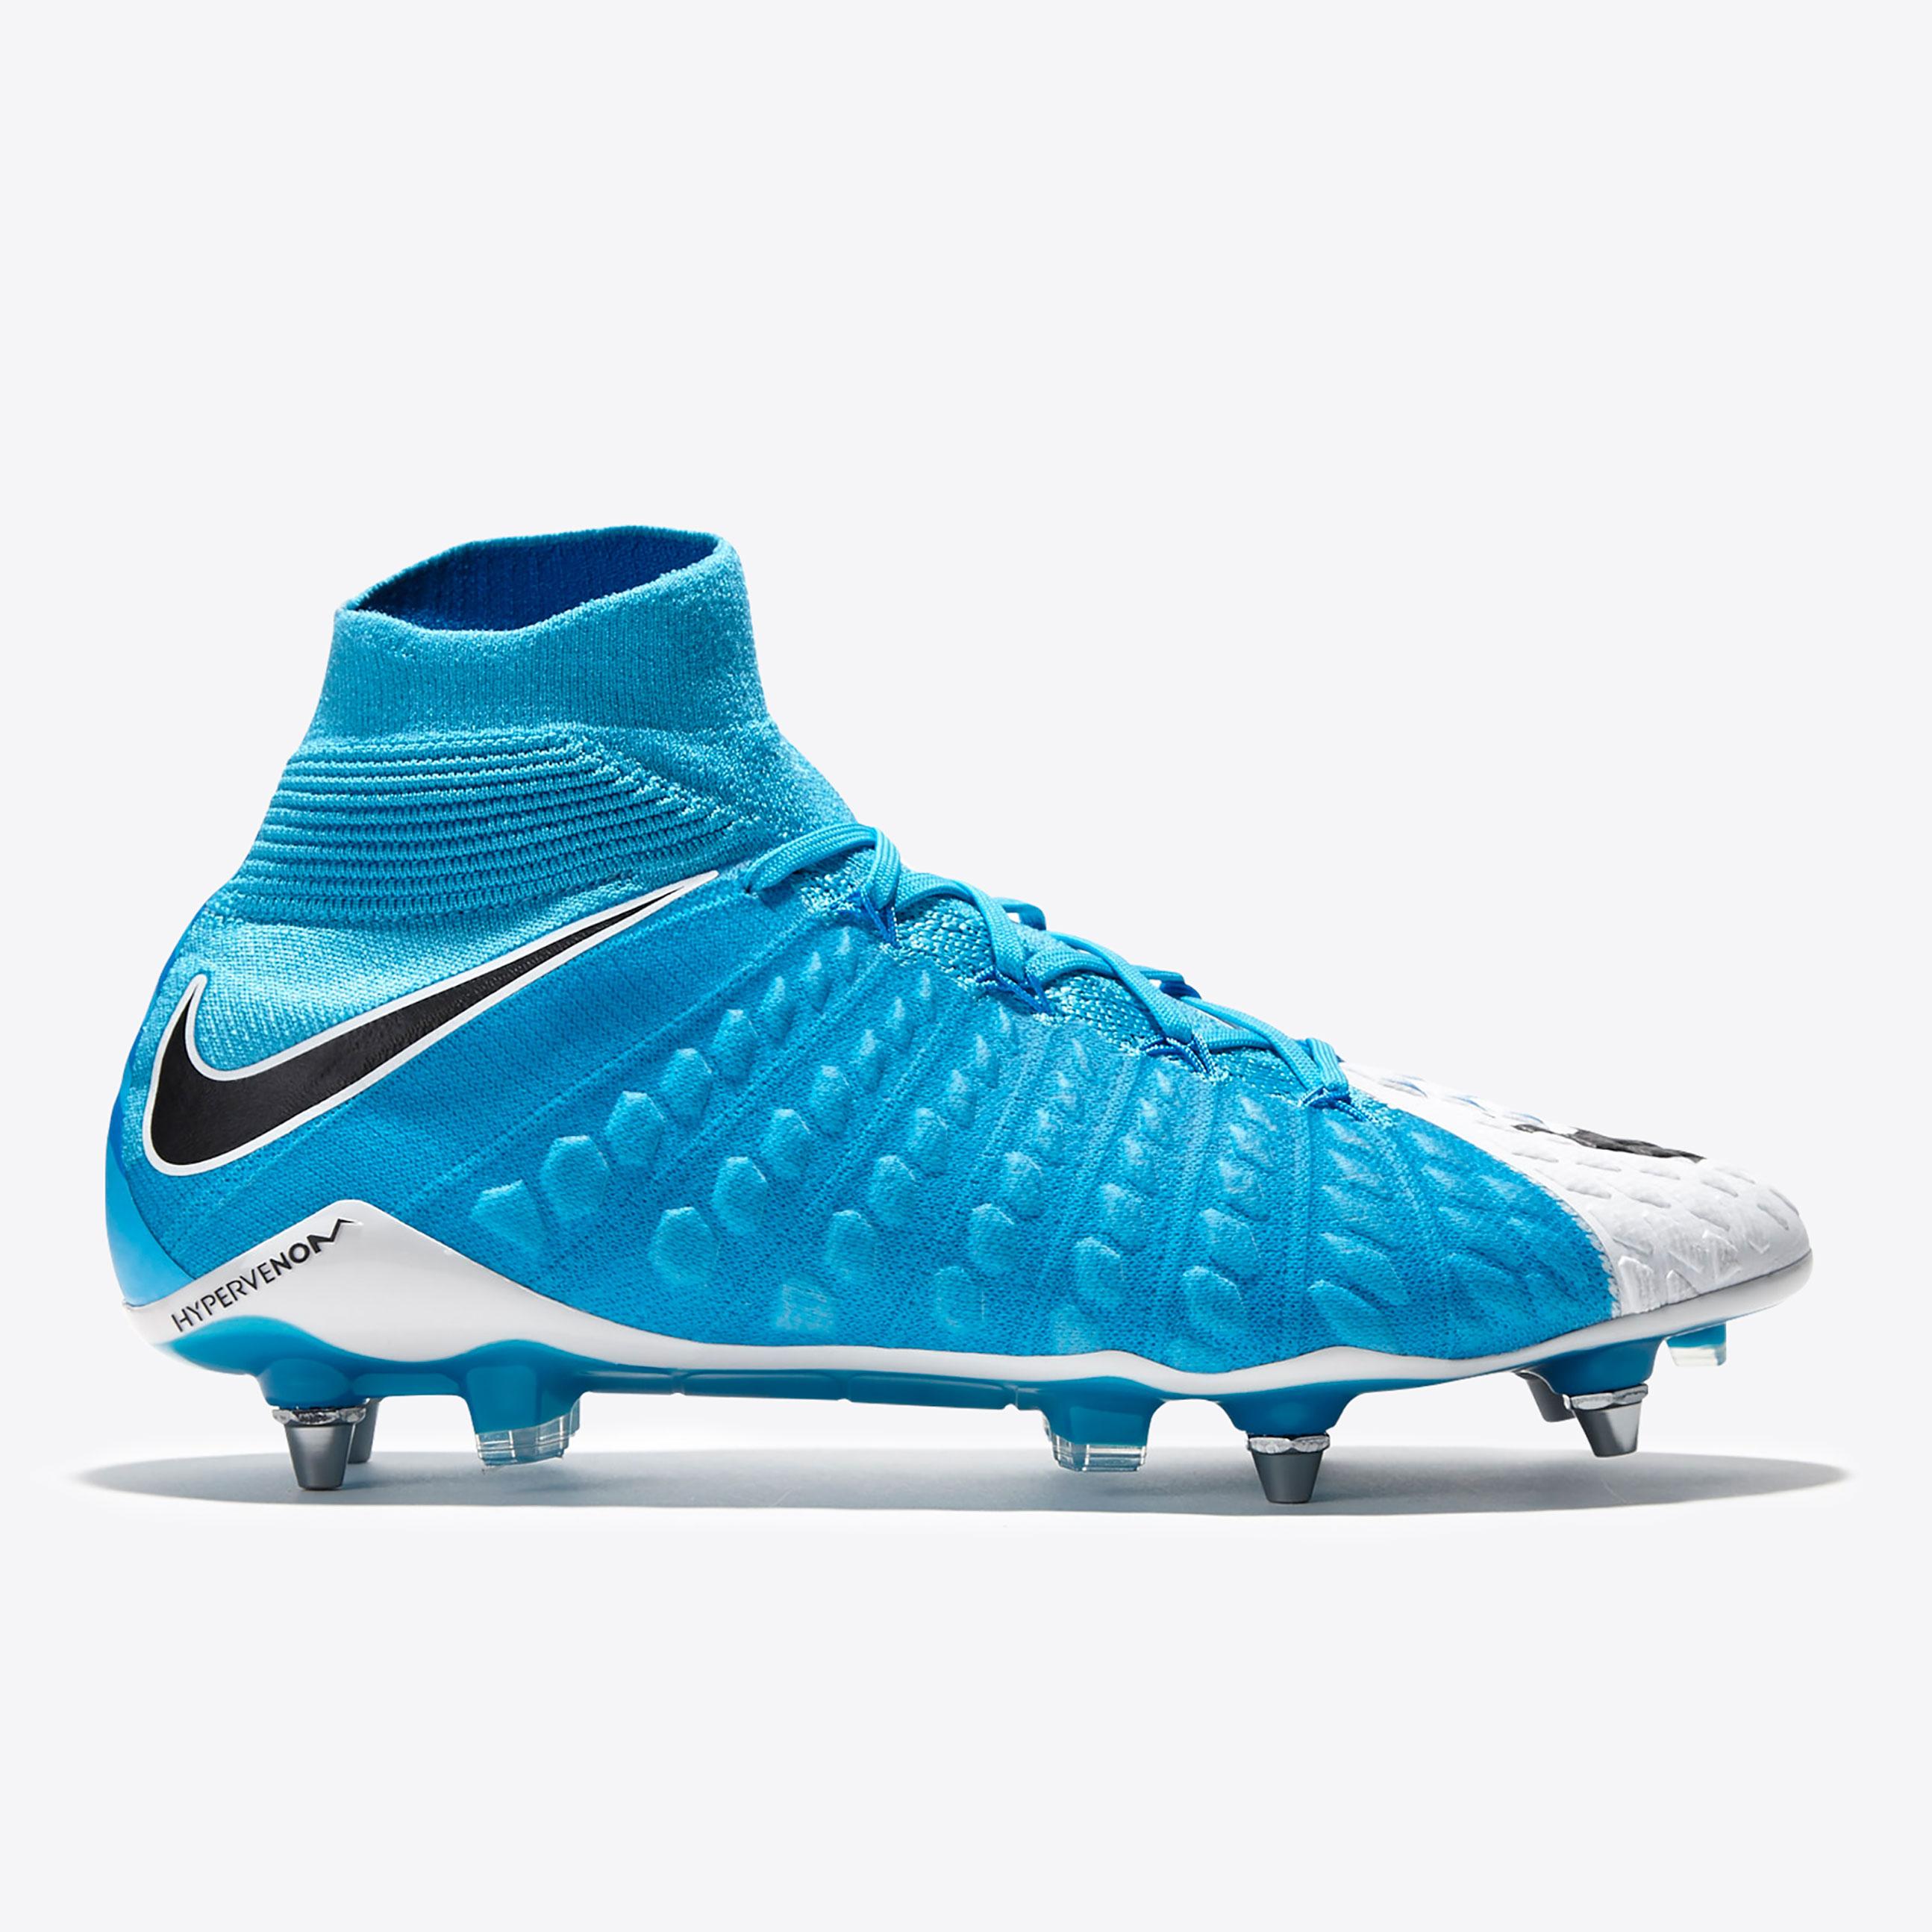 on sale efcd2 562b9 Nike Hypervenom Phantom 3 DF SG-PRO Soft-Ground Football Boot